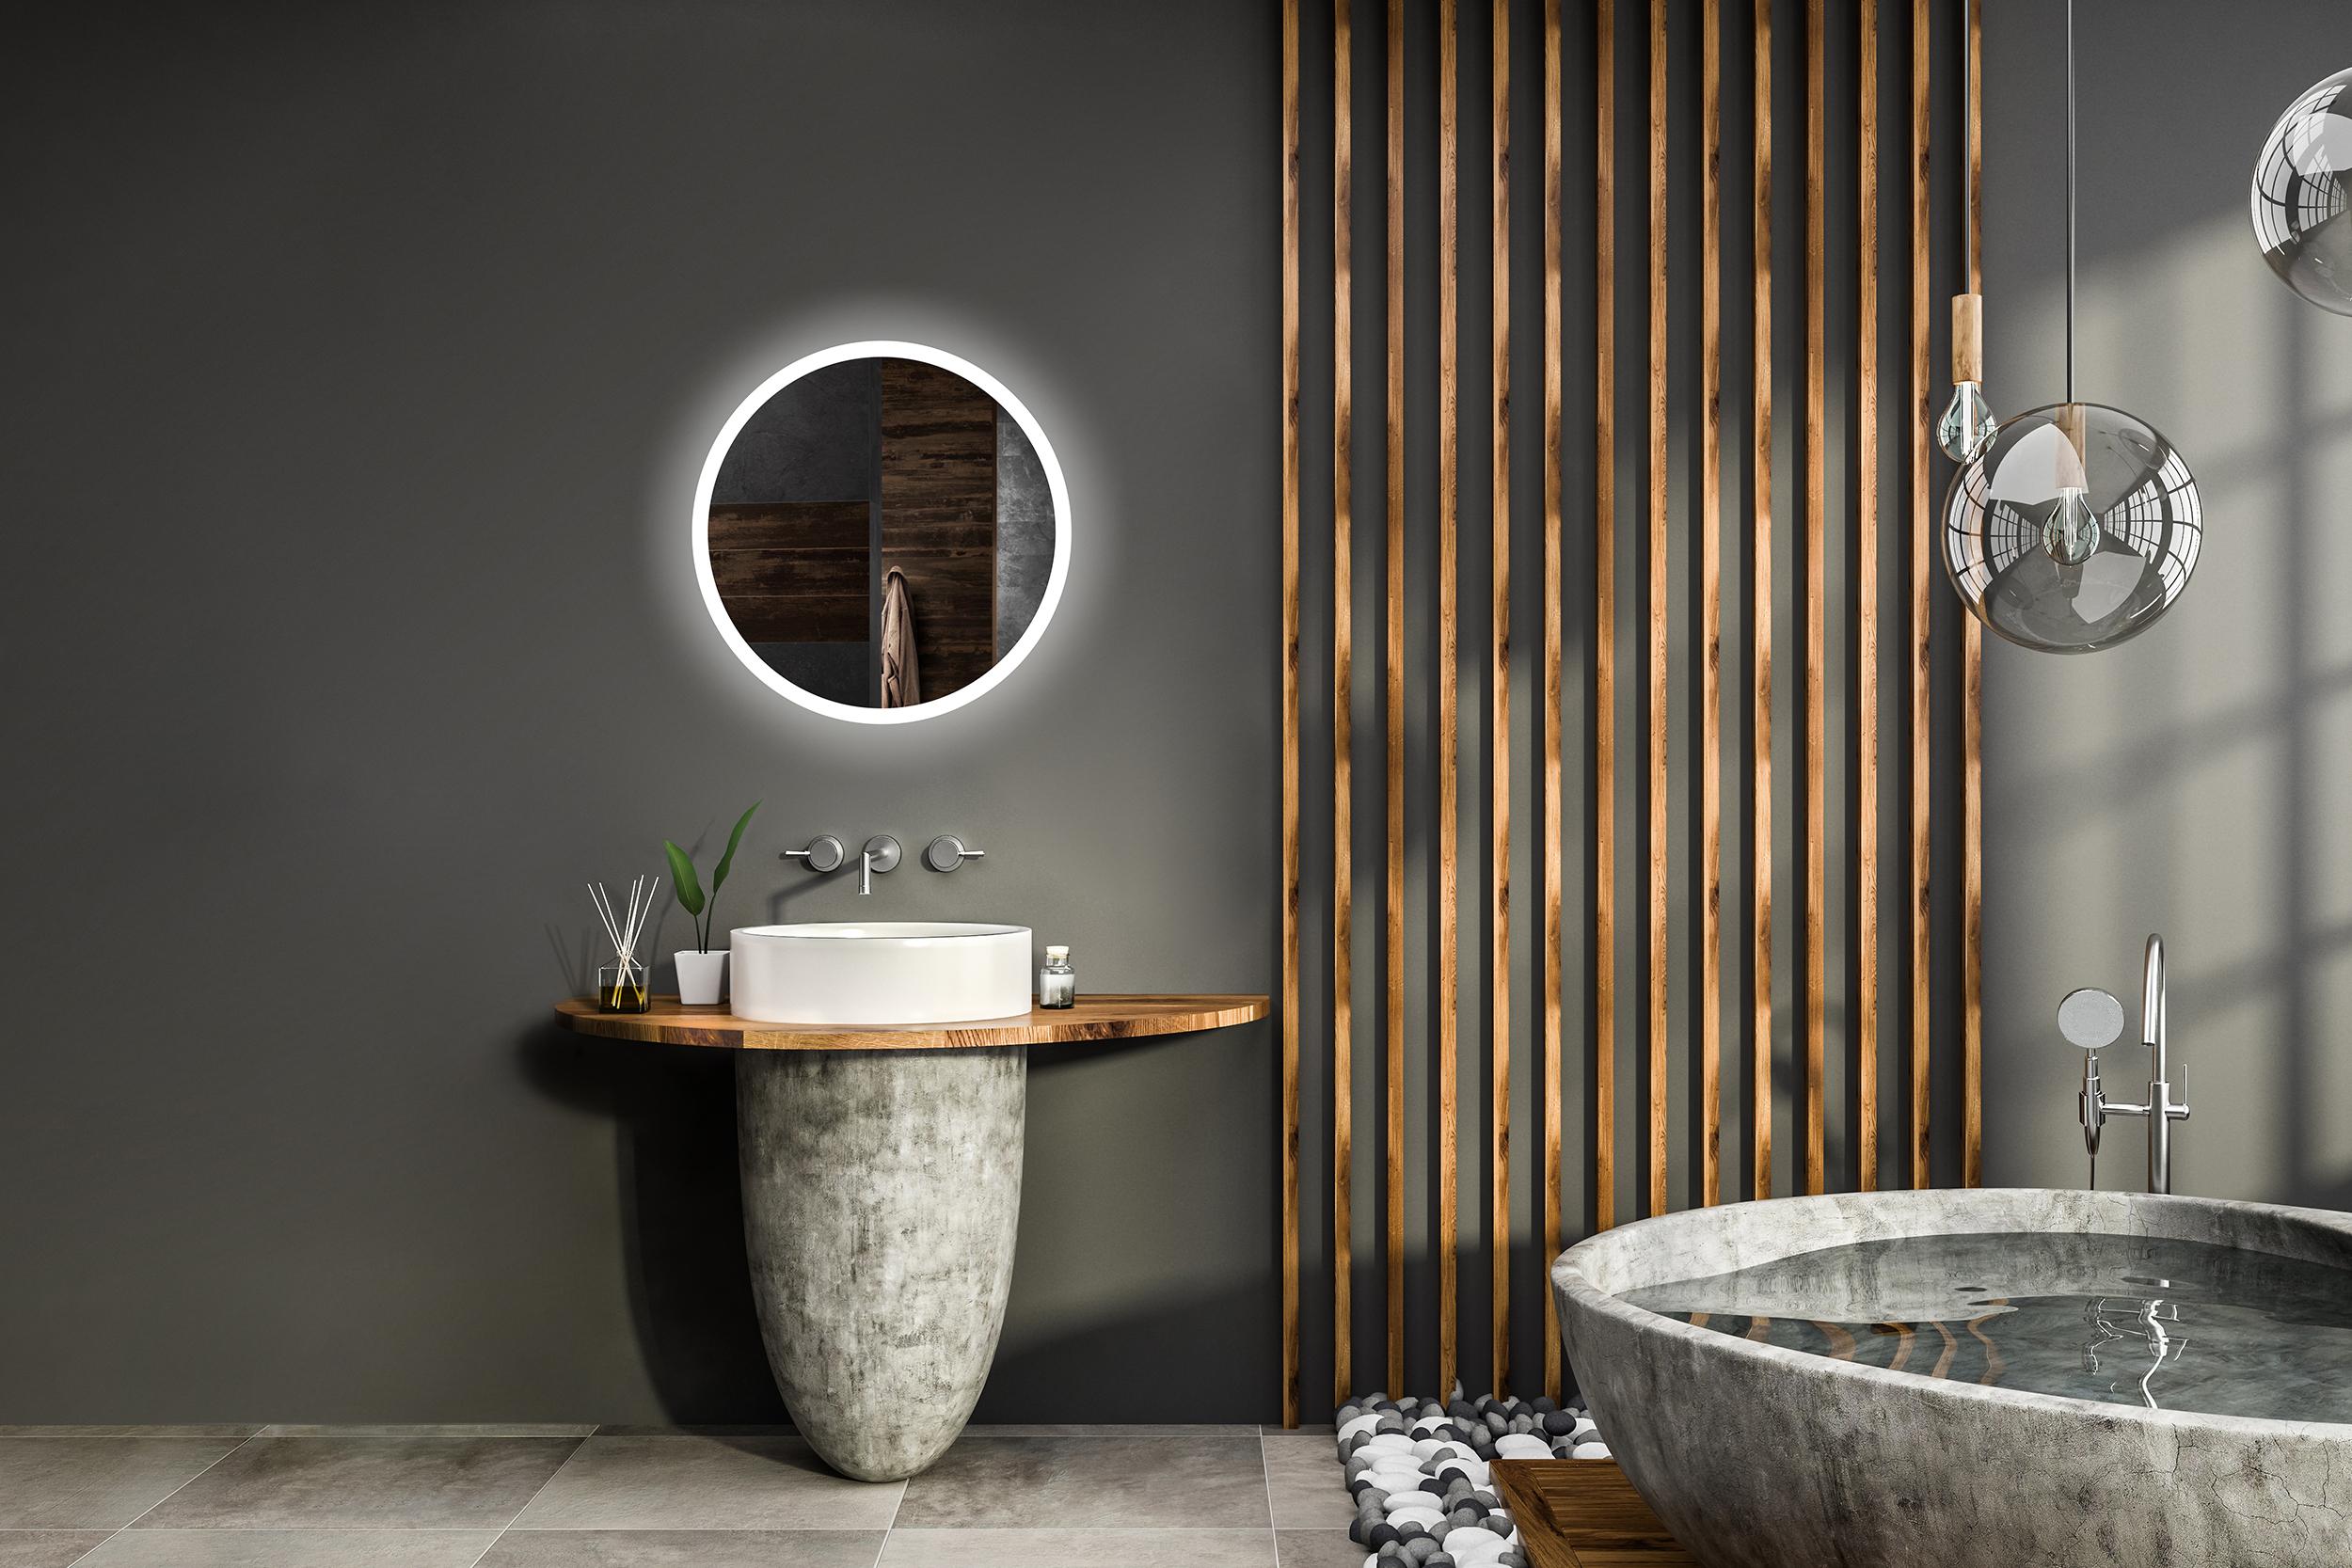 [Paket] LED Badspiegel Beleuchtung / Sensor Schalter / Hollywood  Wandspiegel beleuchtet